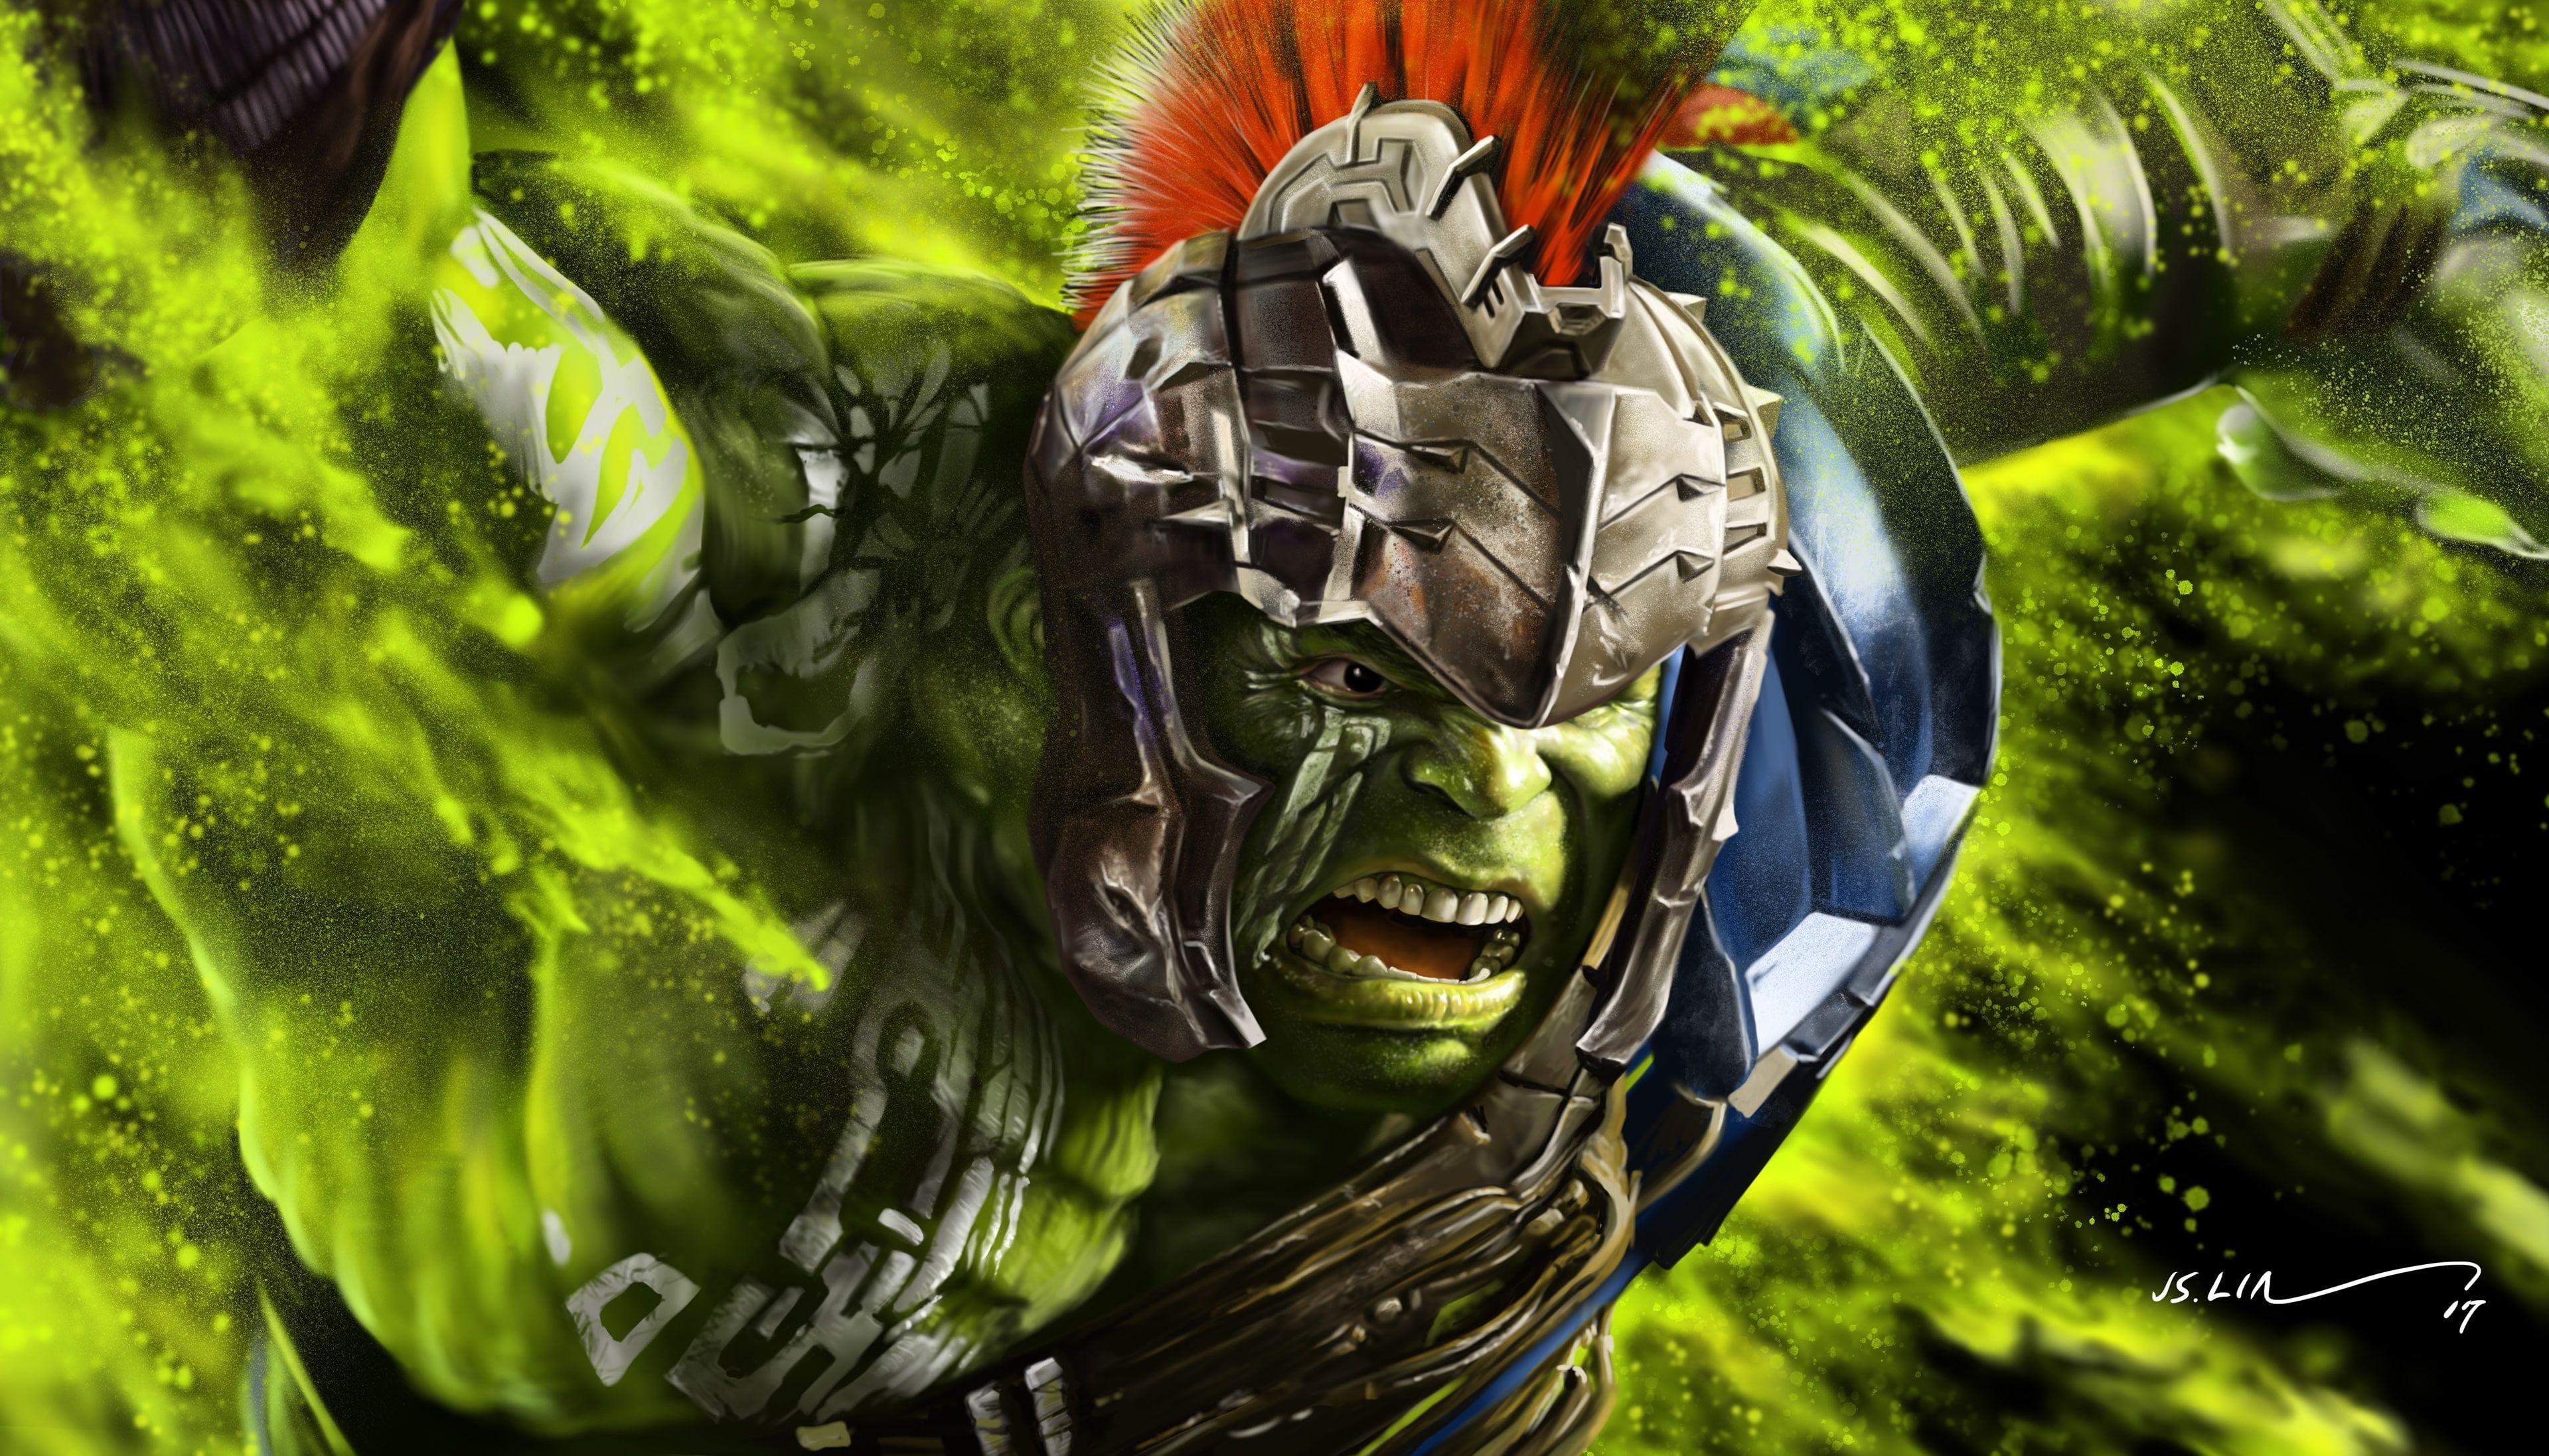 Thor Ragnarok 4k Artwork Hulk 4k Wallpaper Hdwallpaper Desktop Loki Wallpaper Hulk Incredible Hulk